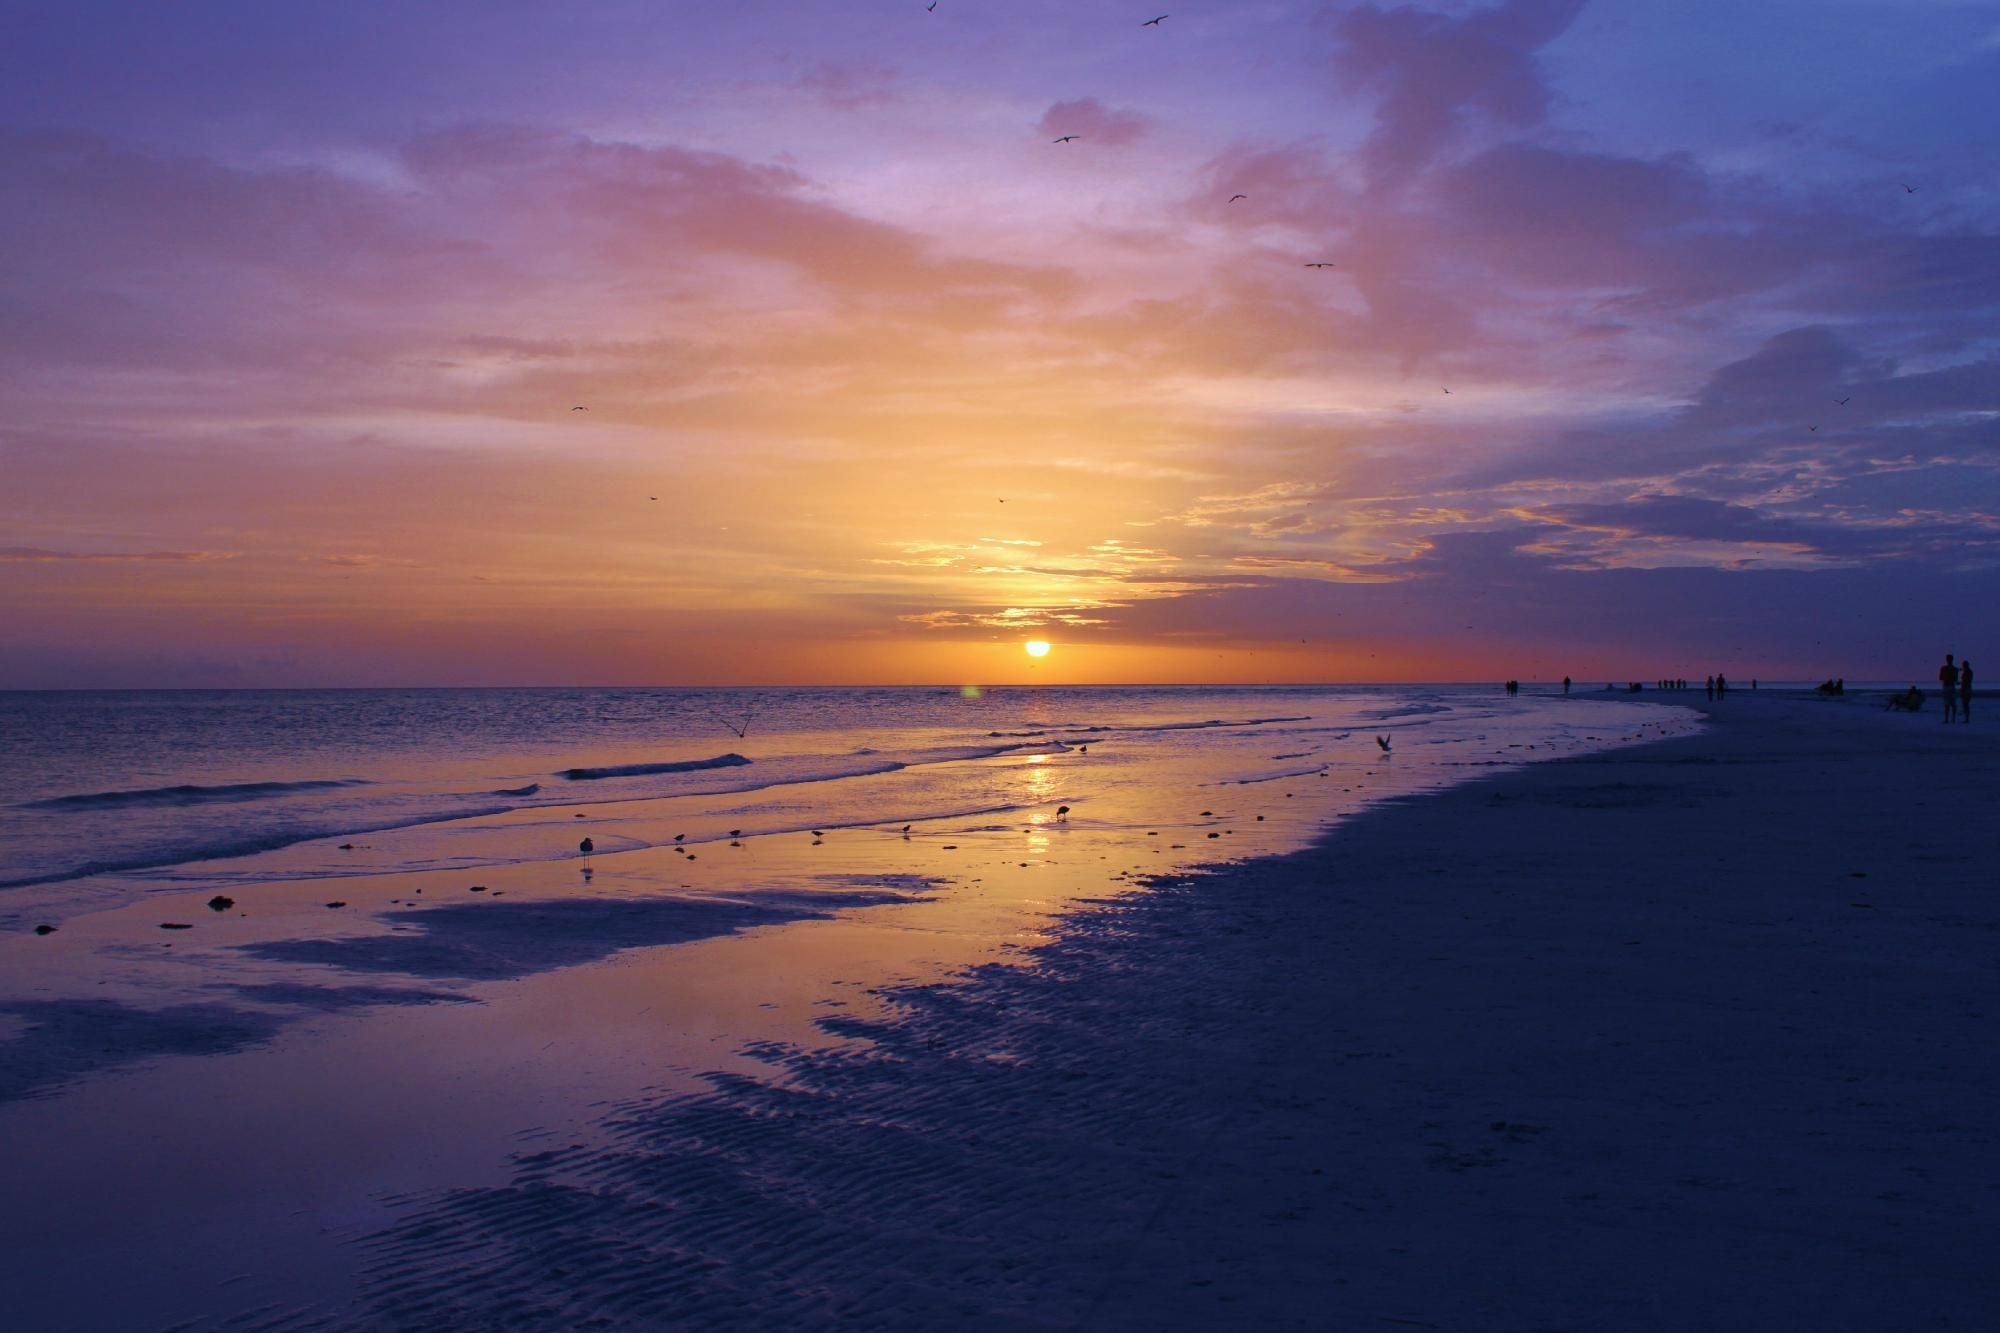 spiagge-siesta-key